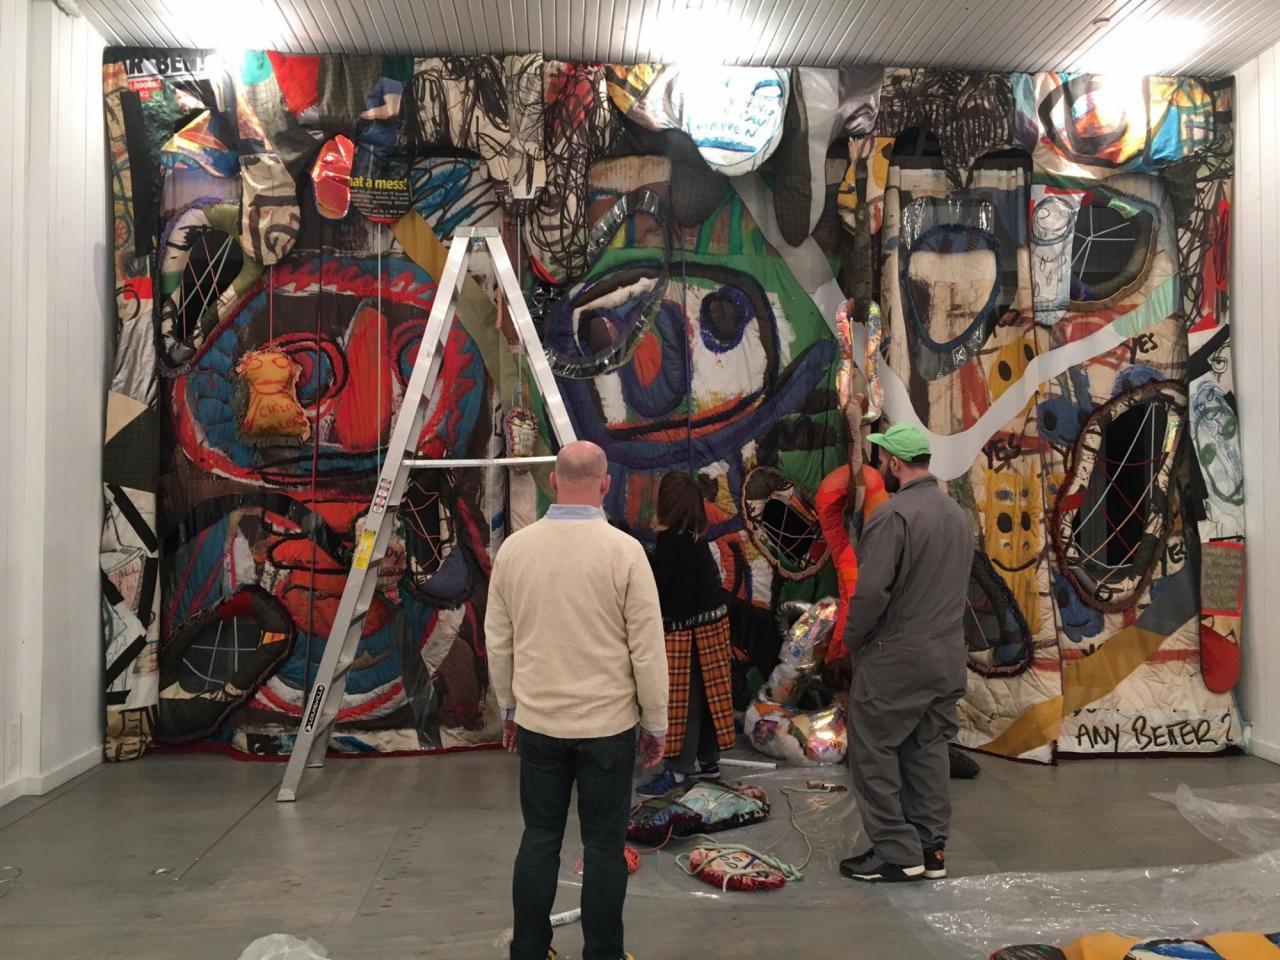 Installing a Bjarne Melgaard show at Karma NYC.